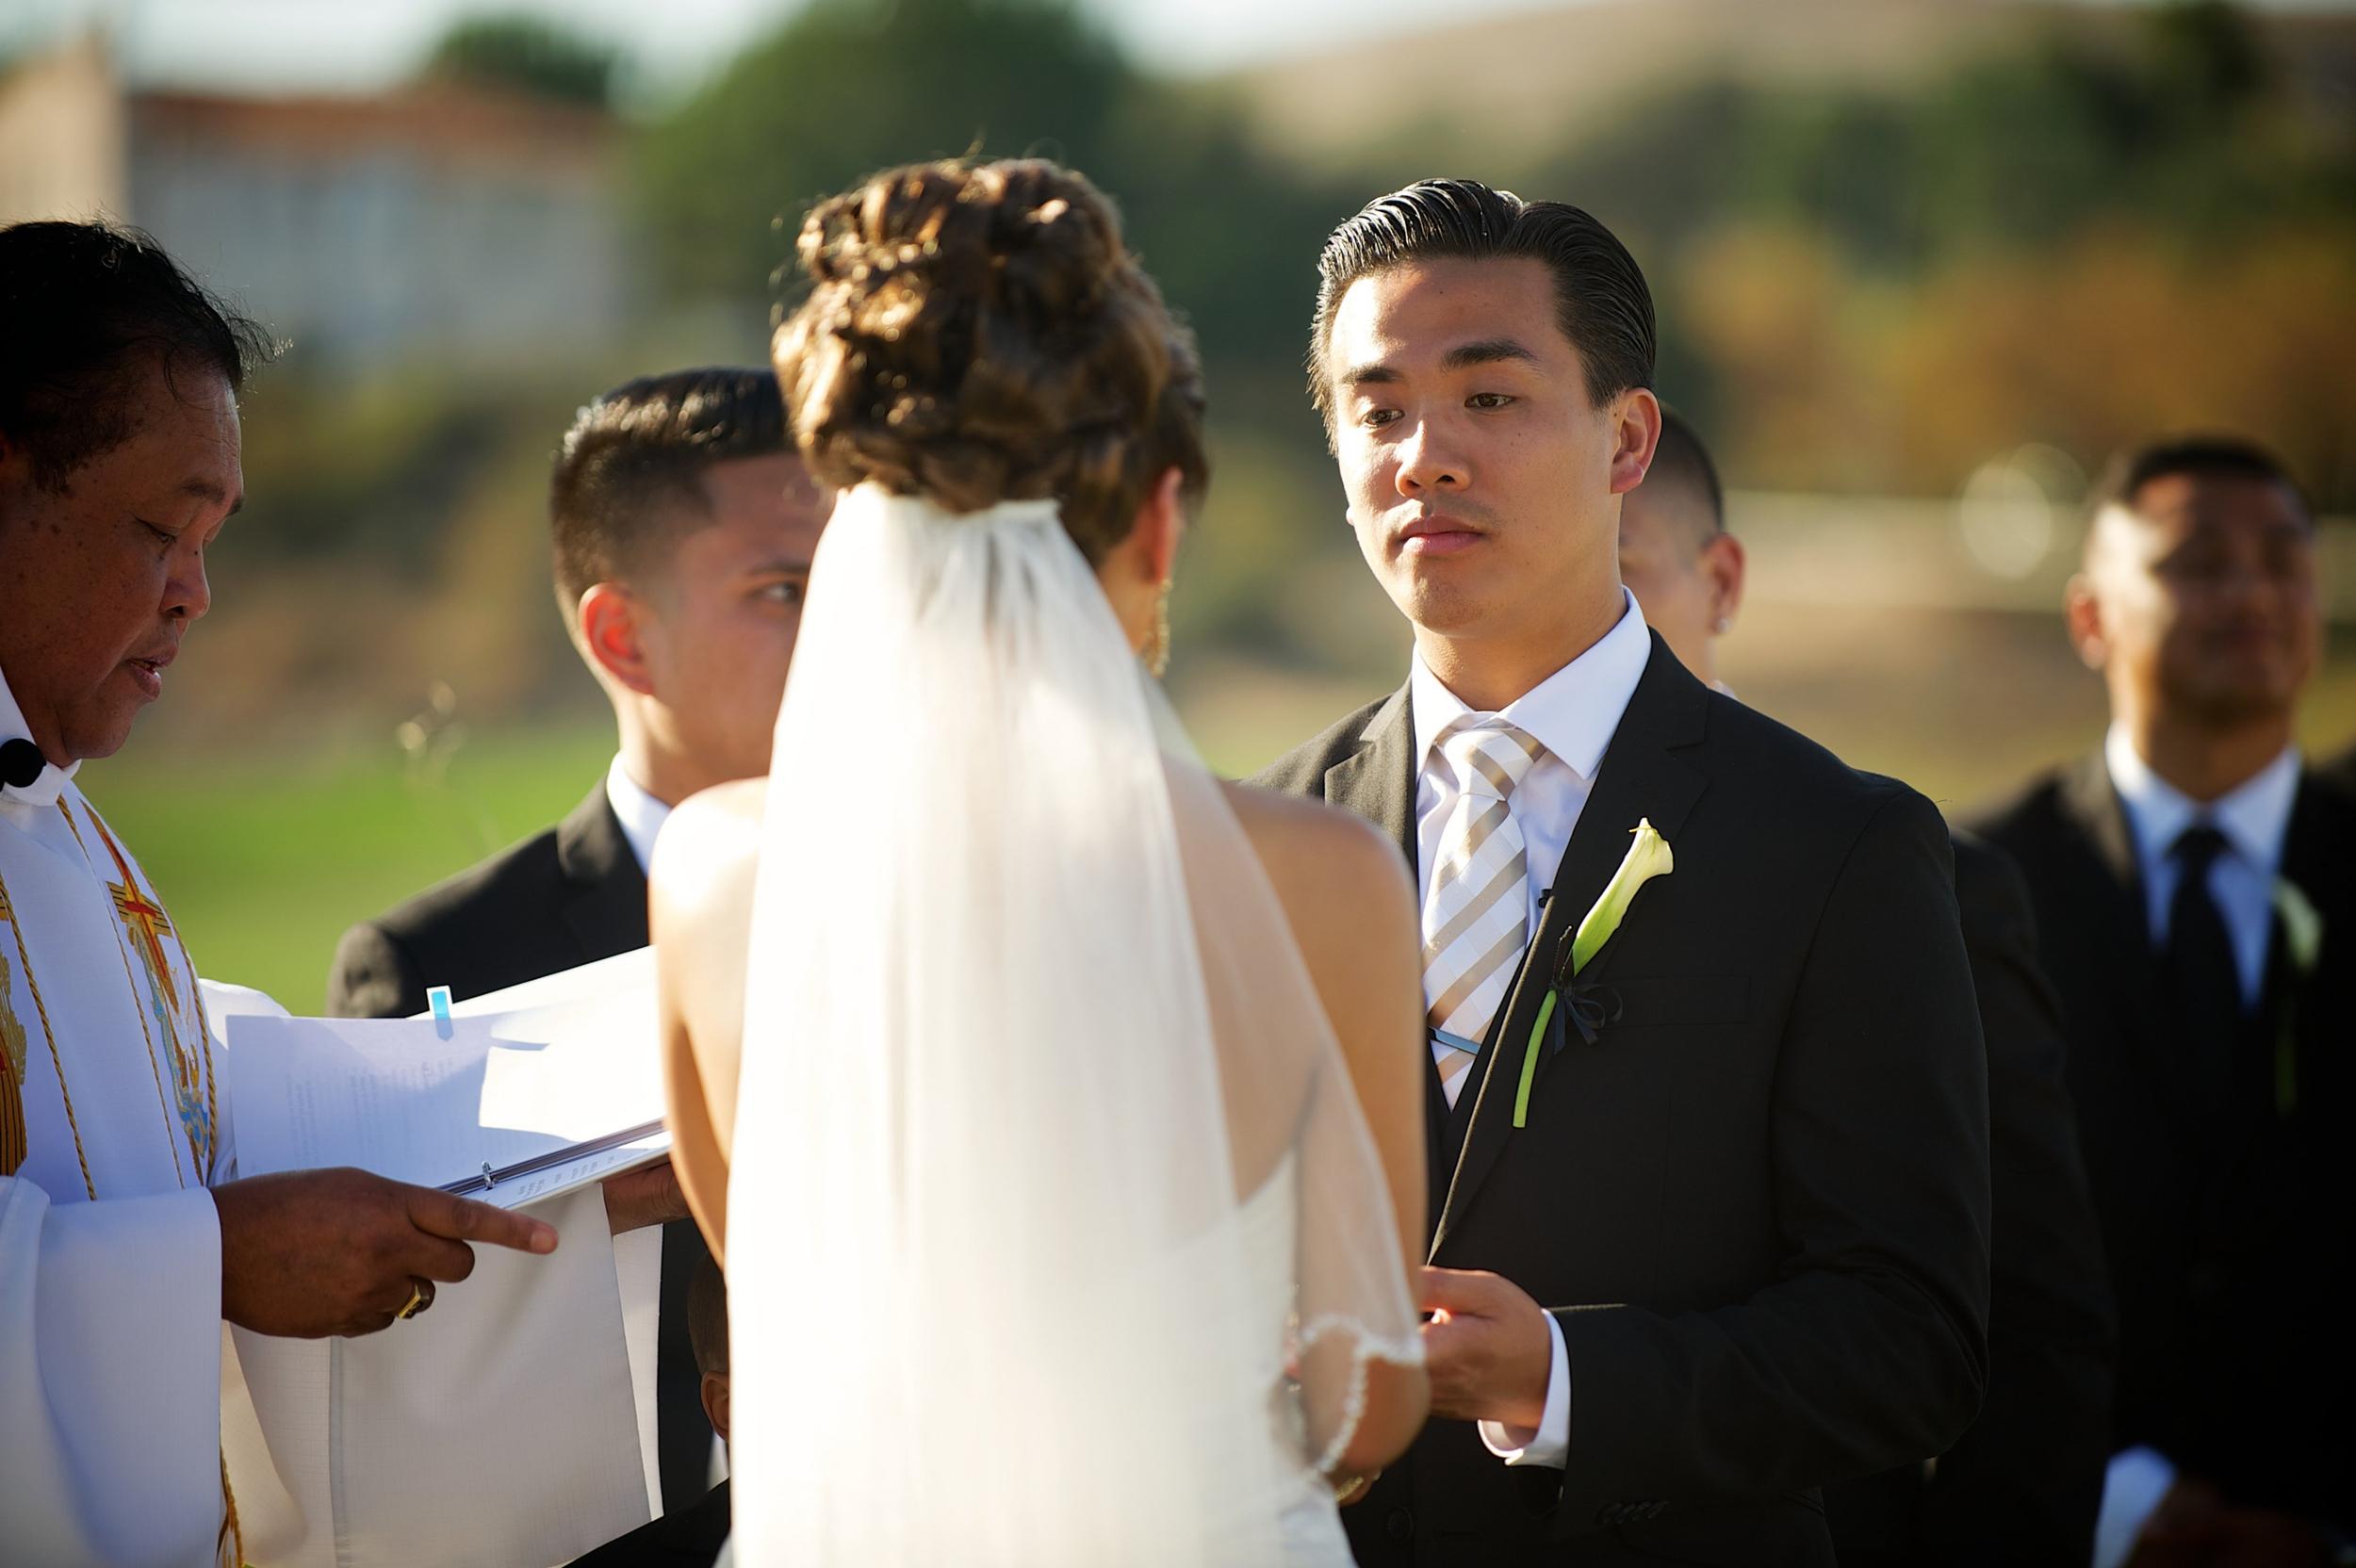 bernadus-lodge-wedding-carmel 6.jpg